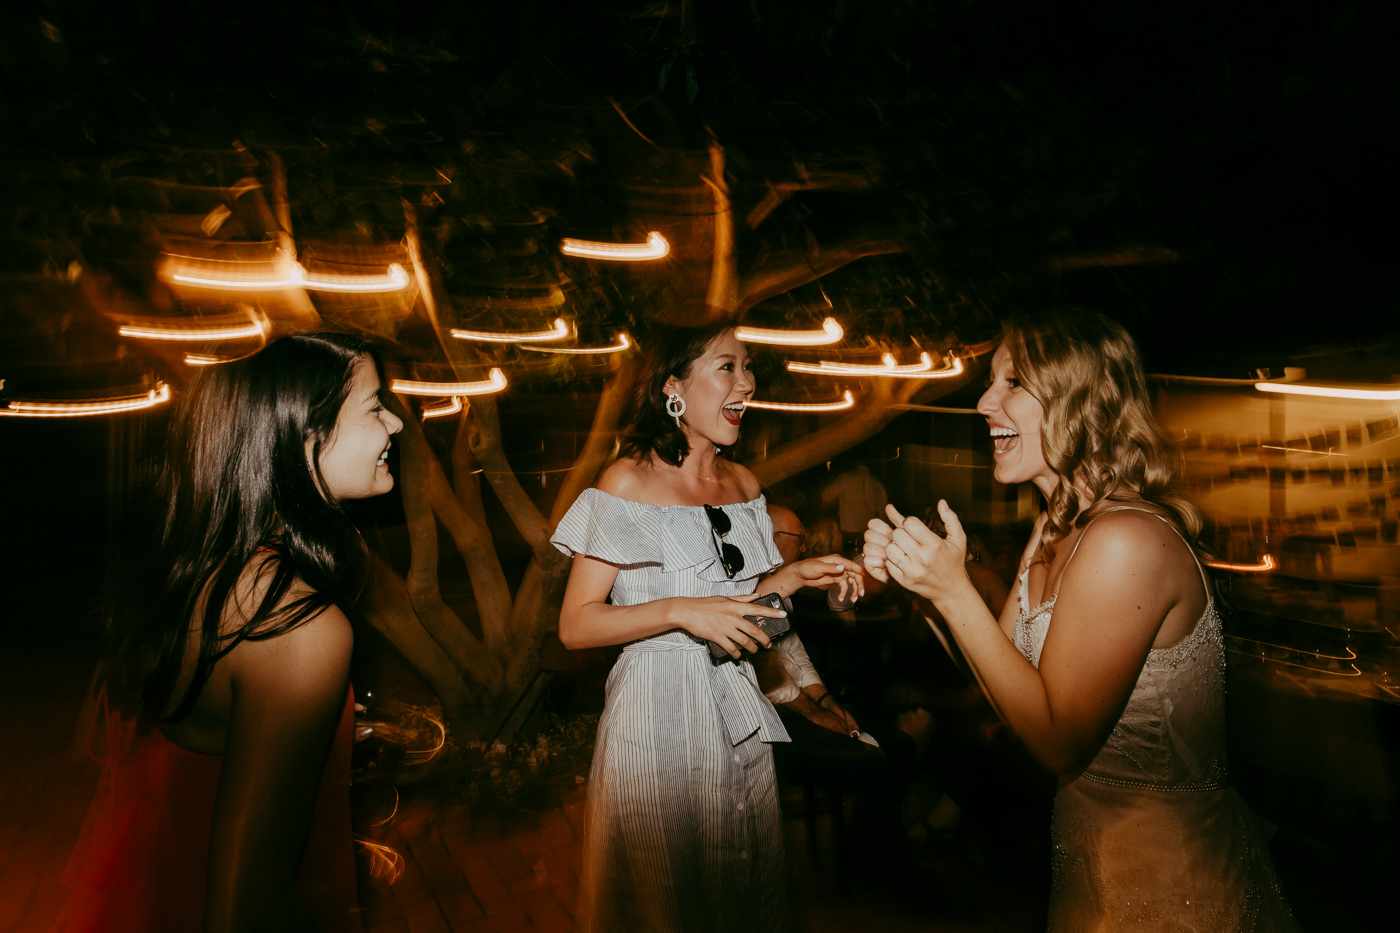 Anthony & Eliet - Wagga Wagga Wedding - Country NSW - Samantha Heather Photography-179.jpg